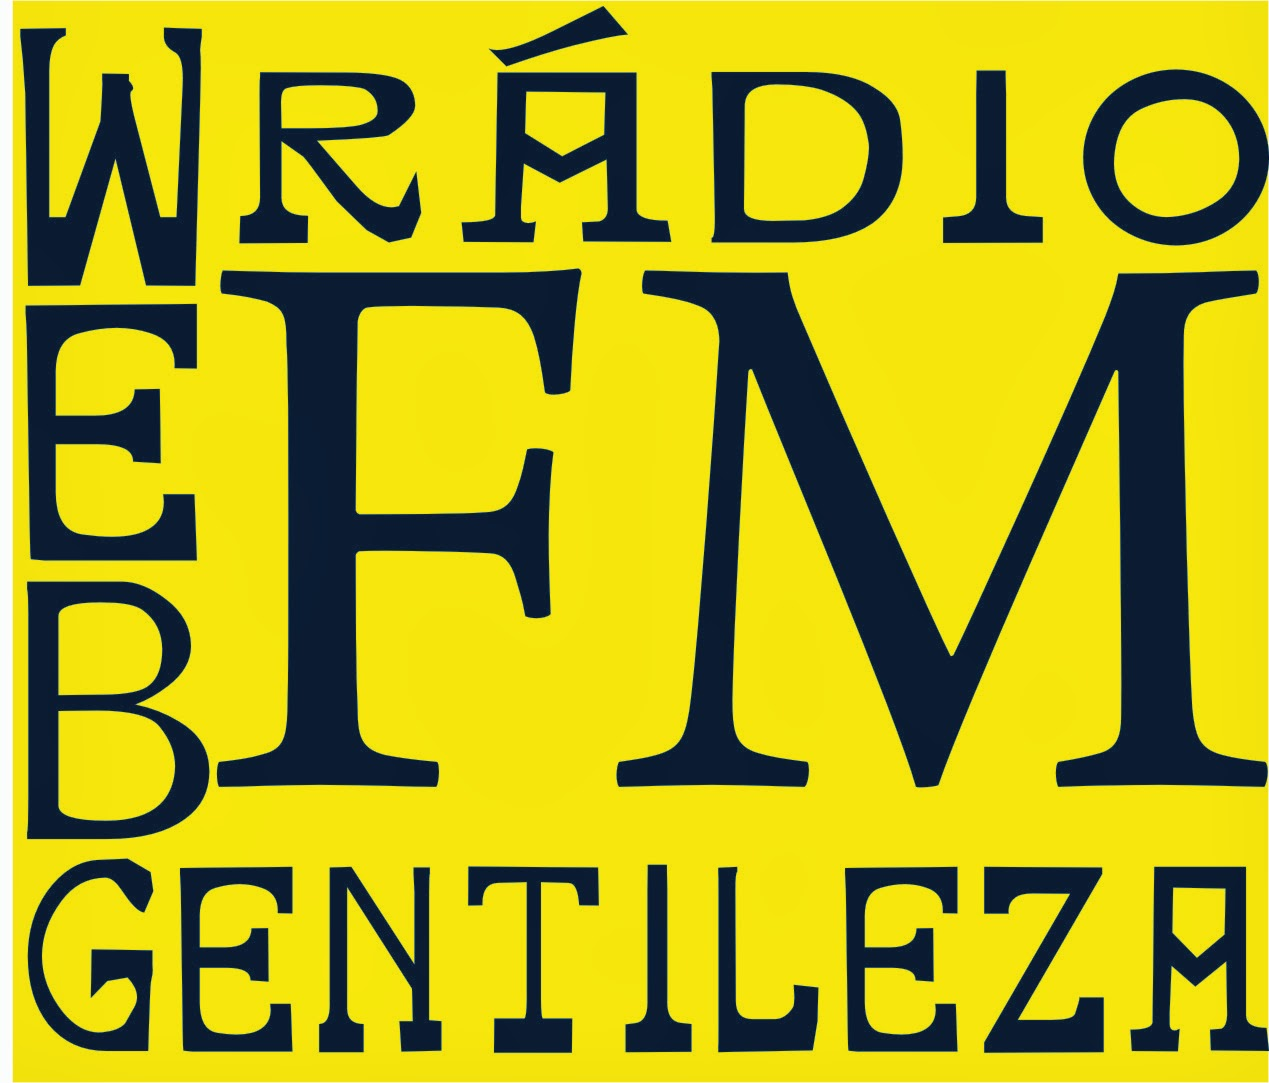 Rádio Gentileza - Mirandópolis-SP